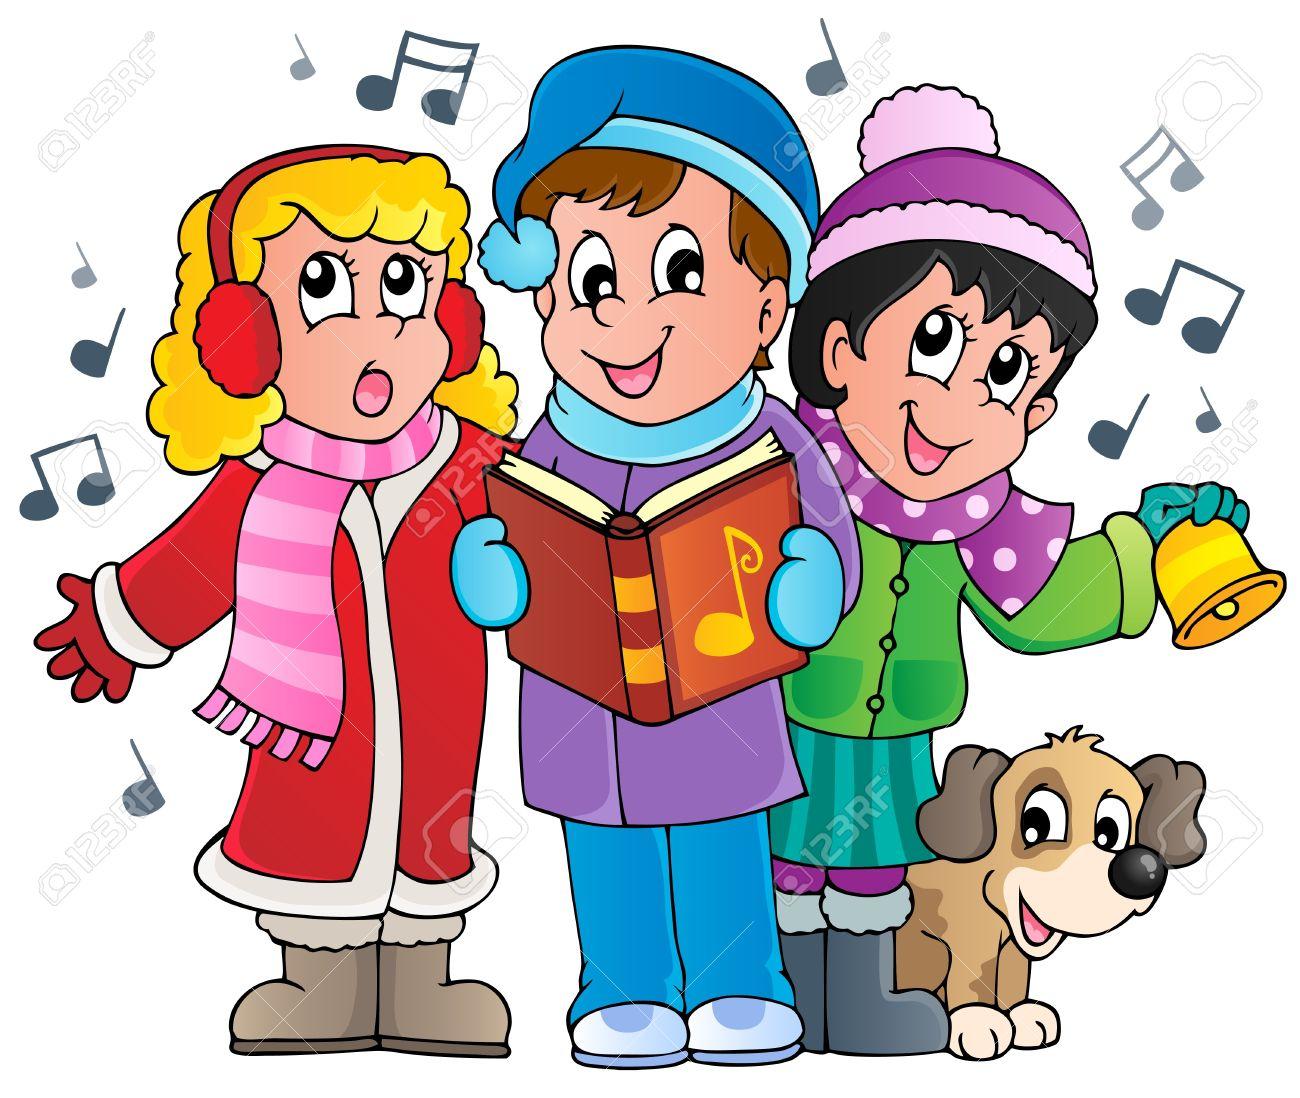 Christmas Carol Singers Theme 1 Royalty Free Cliparts, Vectors ...